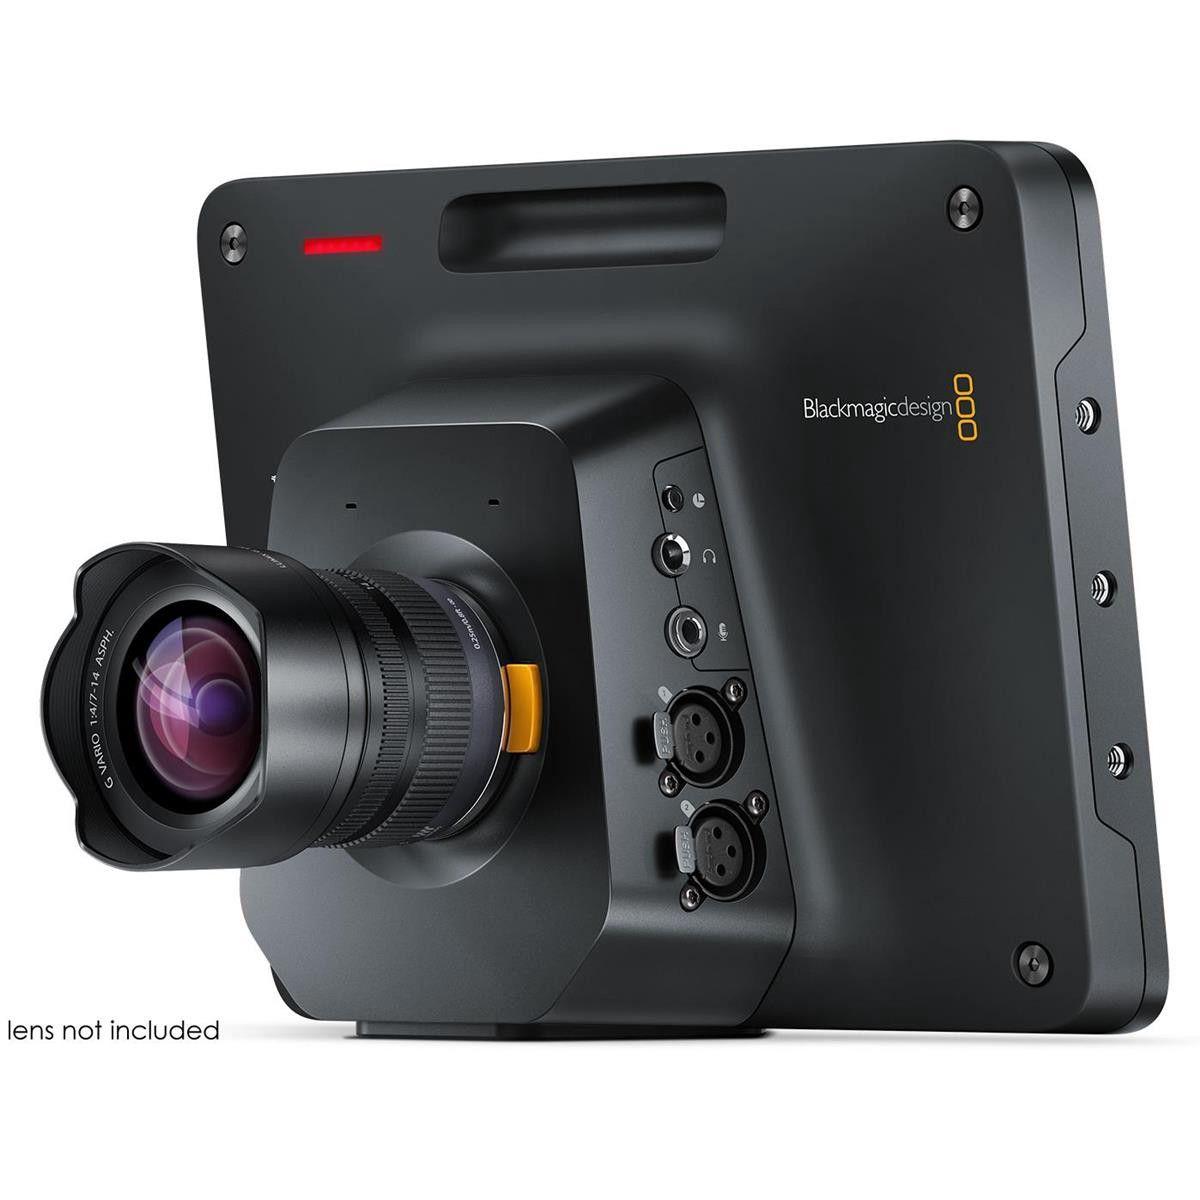 Blackmagic Design Studio Camera 4k 2 In 2020 Blackmagic Design Design Studio Dome Camera